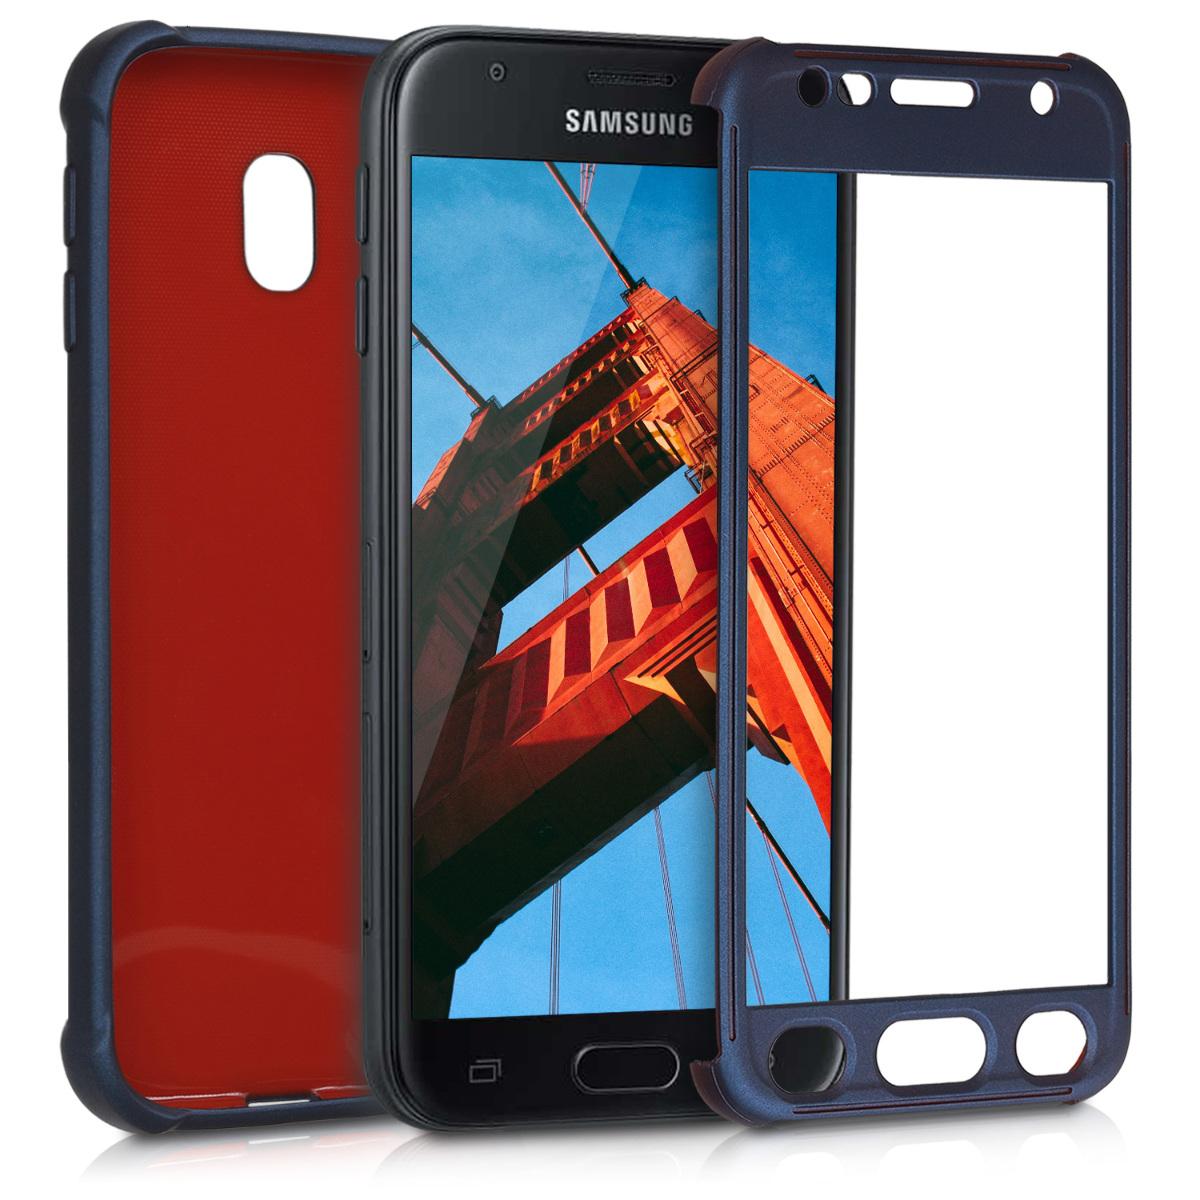 KW Θήκη Σιλικόνης Full Body Samsung Galaxy J3 2017 - Σκούρο μπλε μεταλλικό  (41807.99)